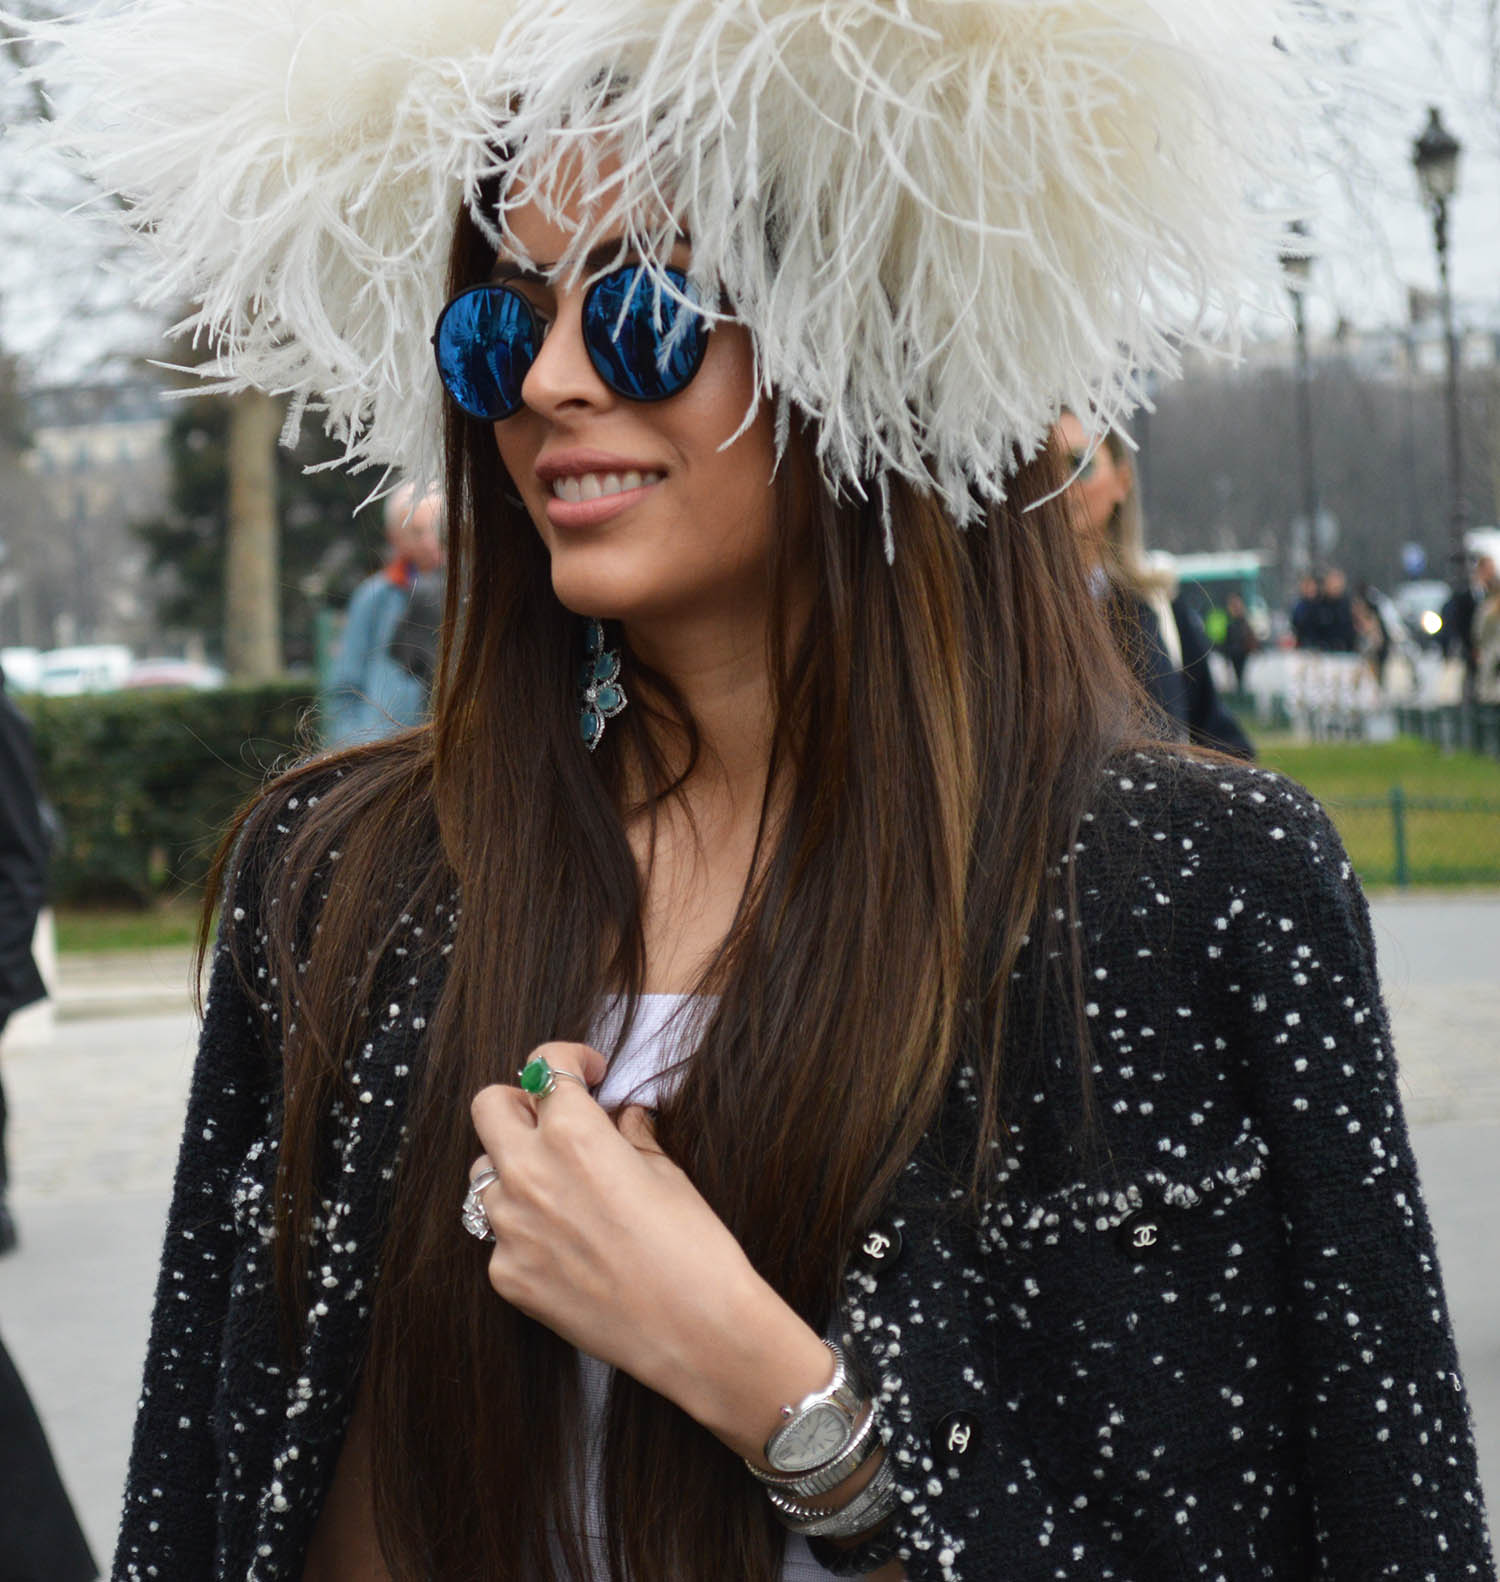 laparvenue-chanel-fashion-blog-paris-raphaelle-leboeuf-5.jpg